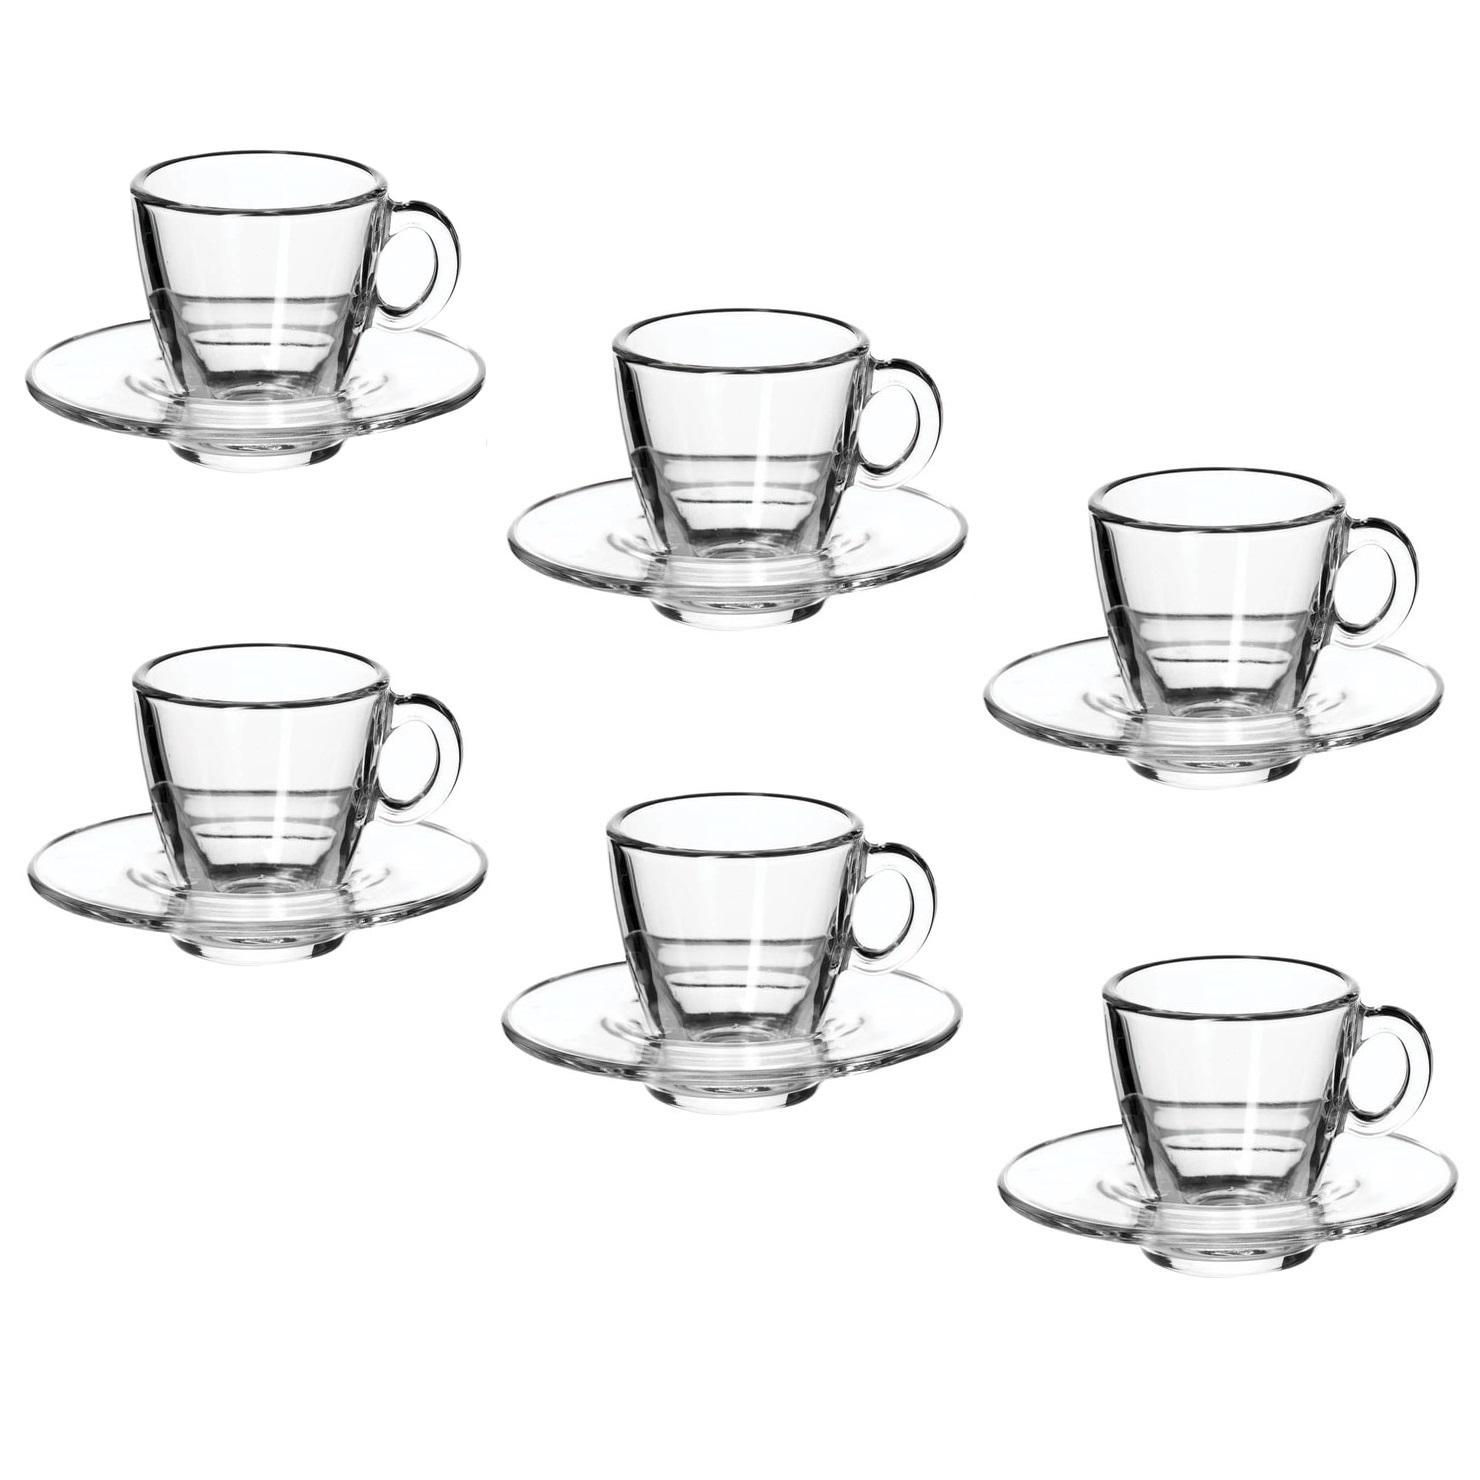 Кофейный набор Aqua на 6 персон, 215 мл